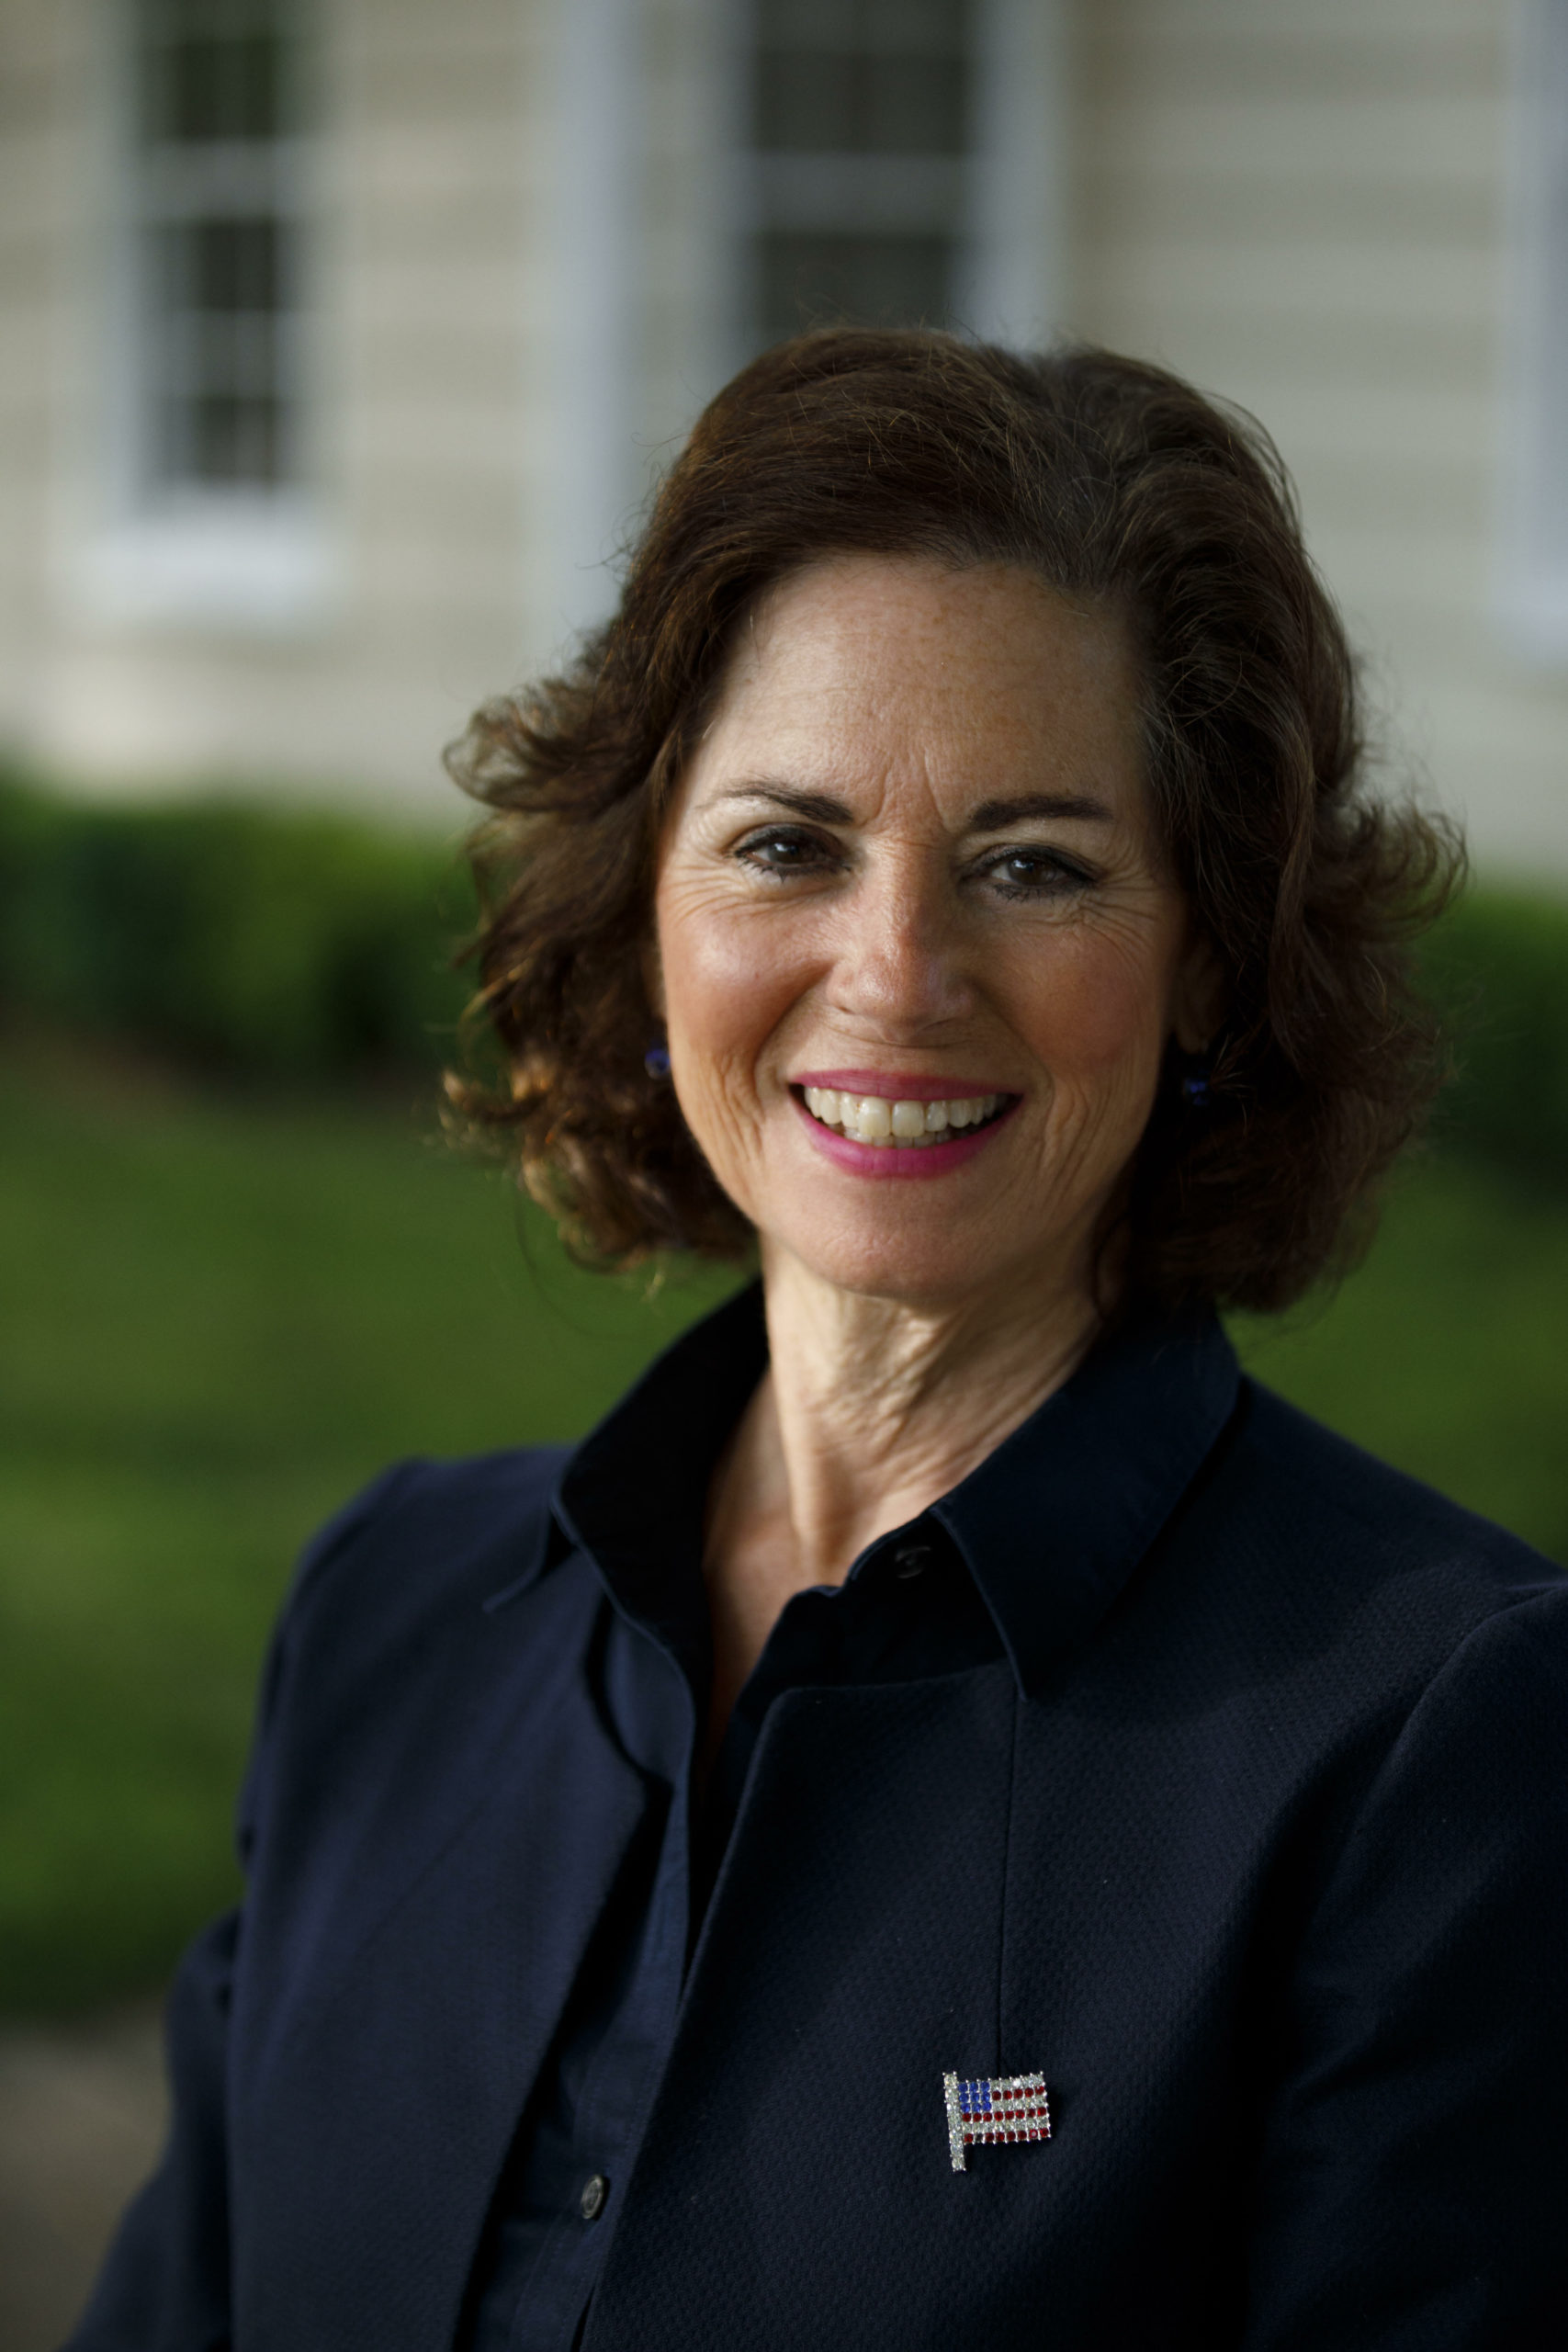 Gina Arresta will run for Southampton Village Board.